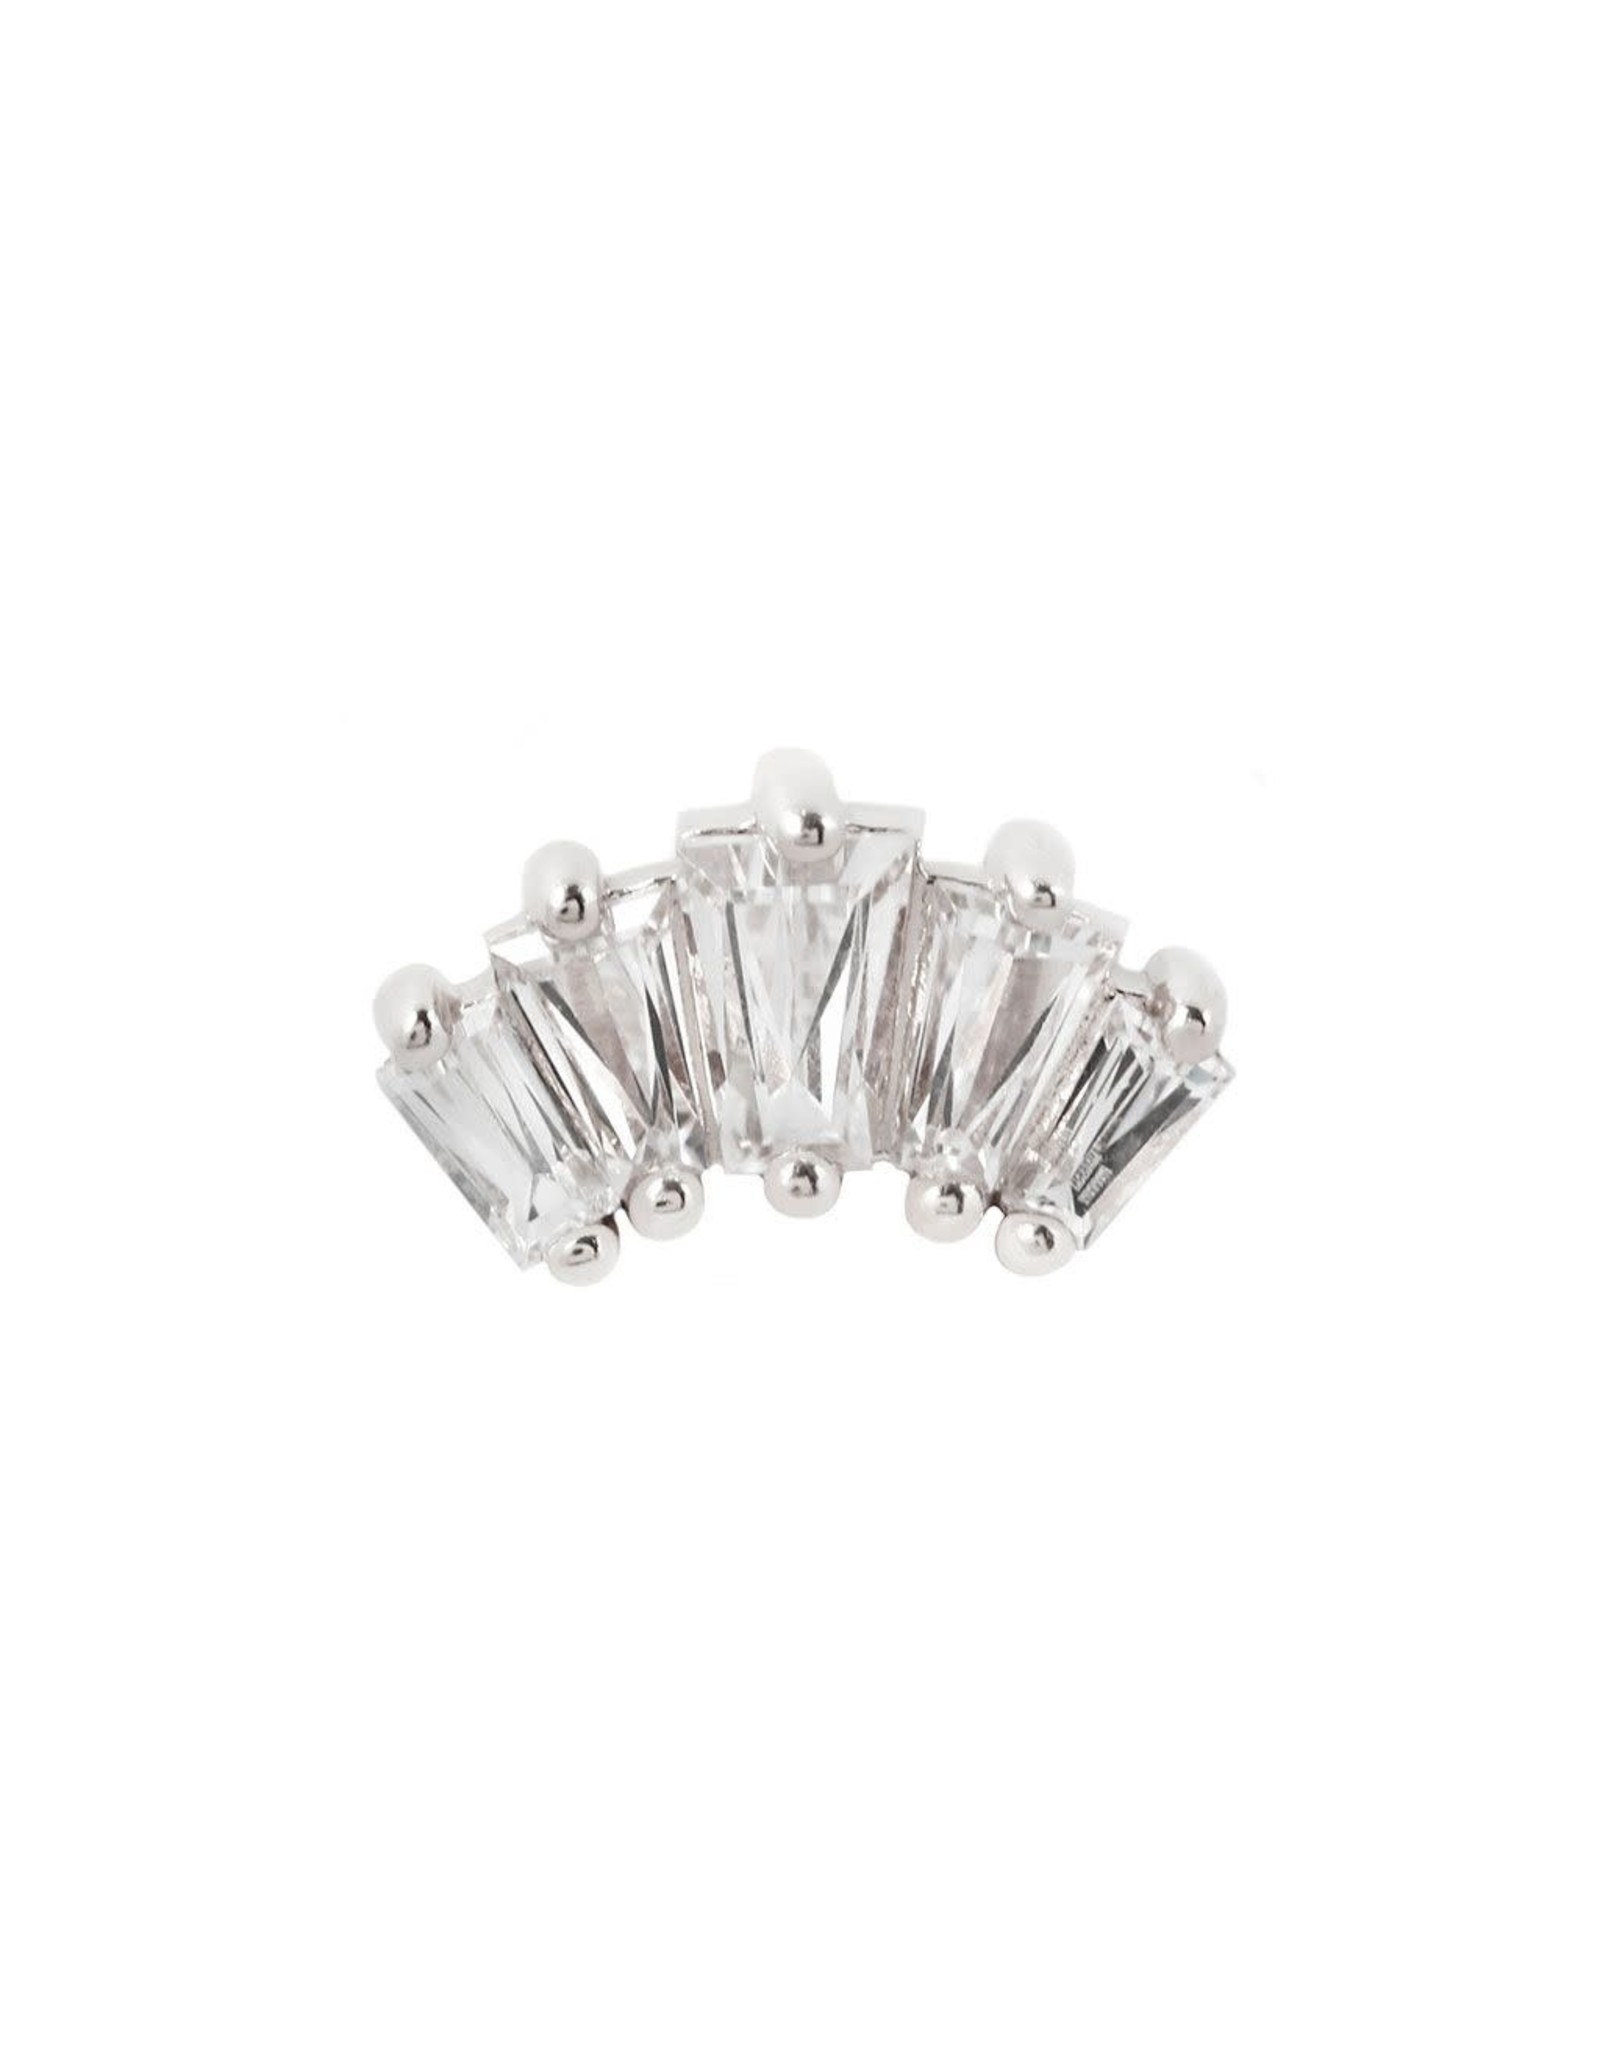 "Buddha Jewelry Organics Buddha Jewelry Organic gold ""Gemma Cinq"" press fit end with tapered baguette-cut CZs"